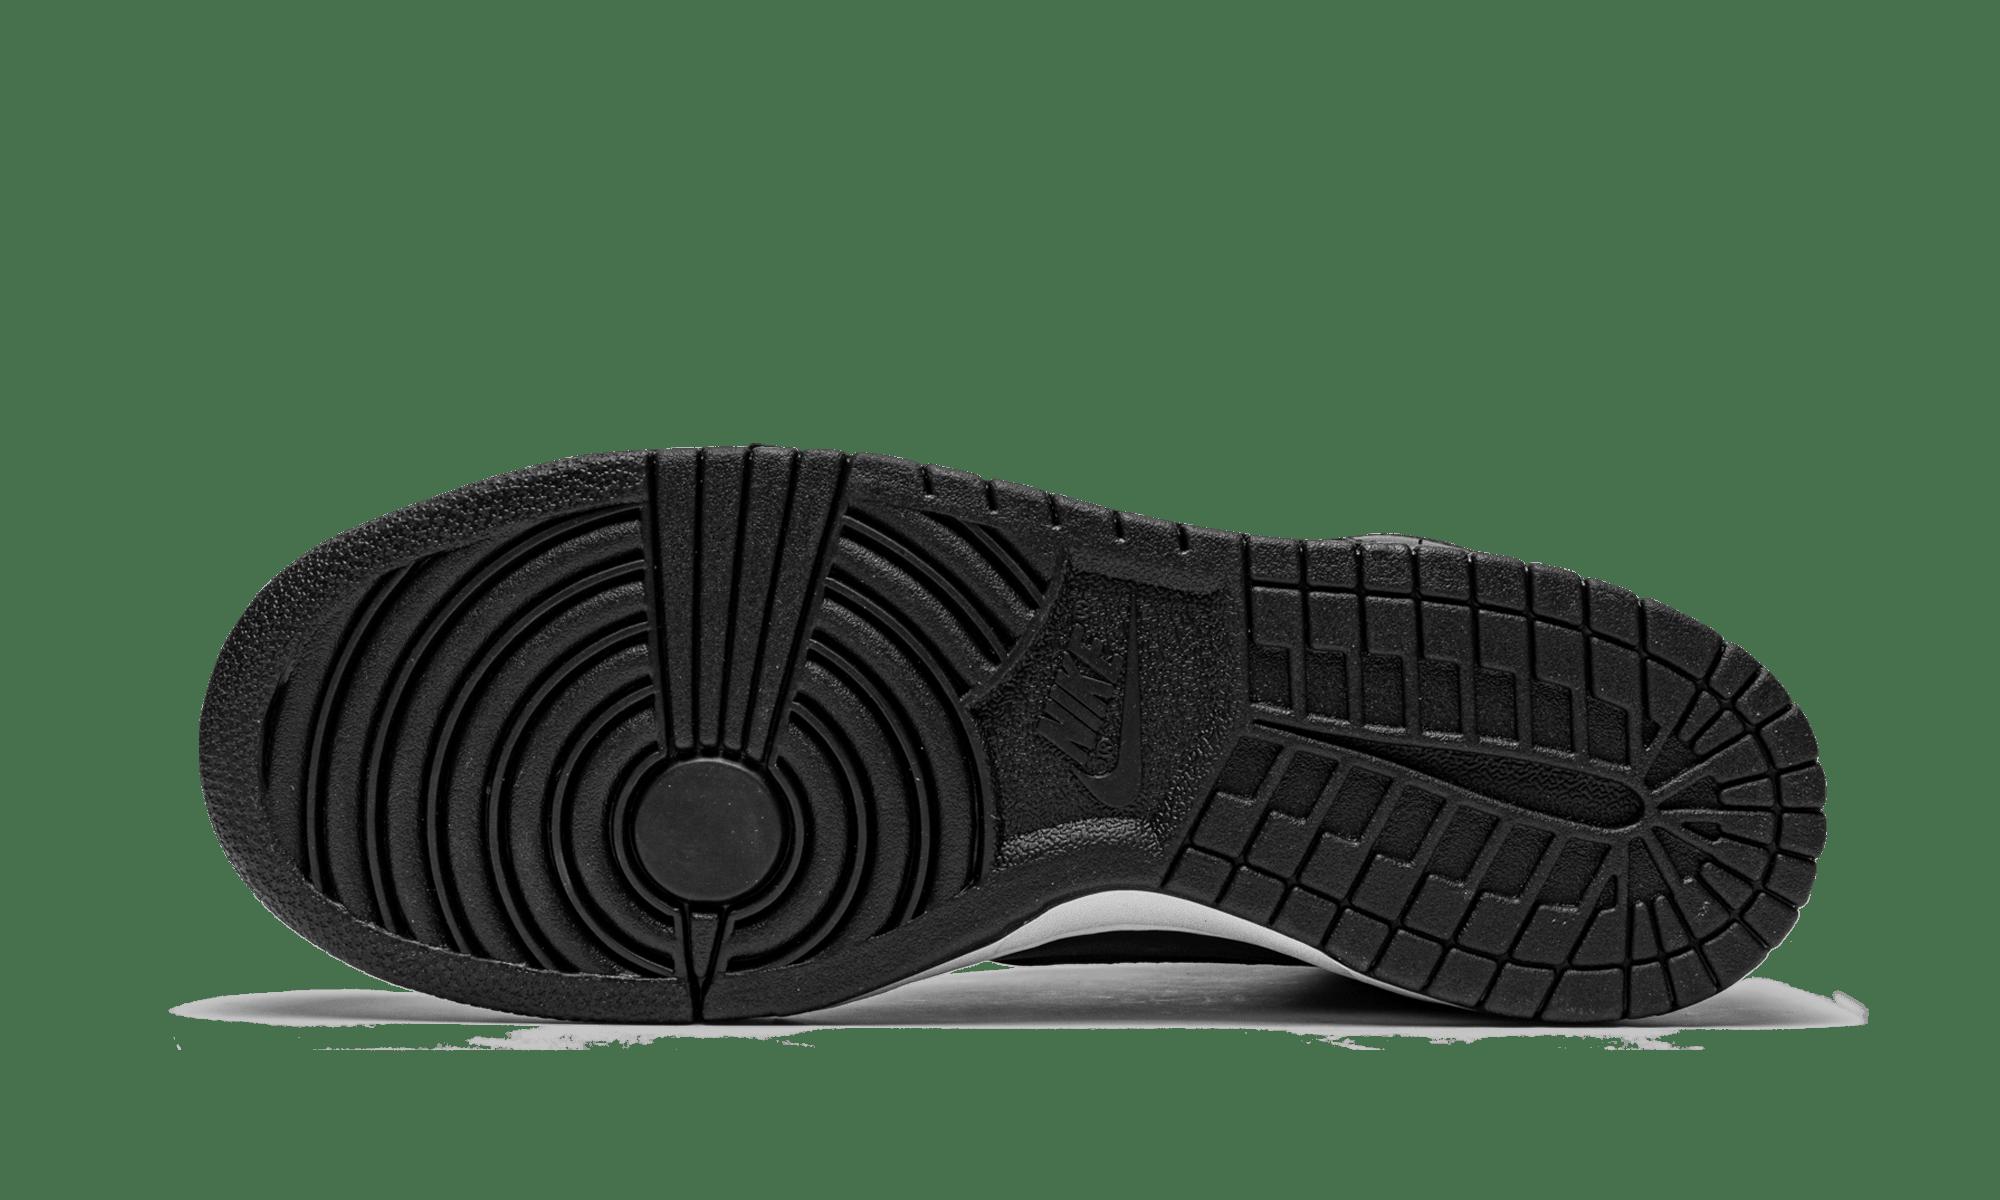 Fragment x Nike Dunk High Wine/Black/White 'Beijing' (Sole)